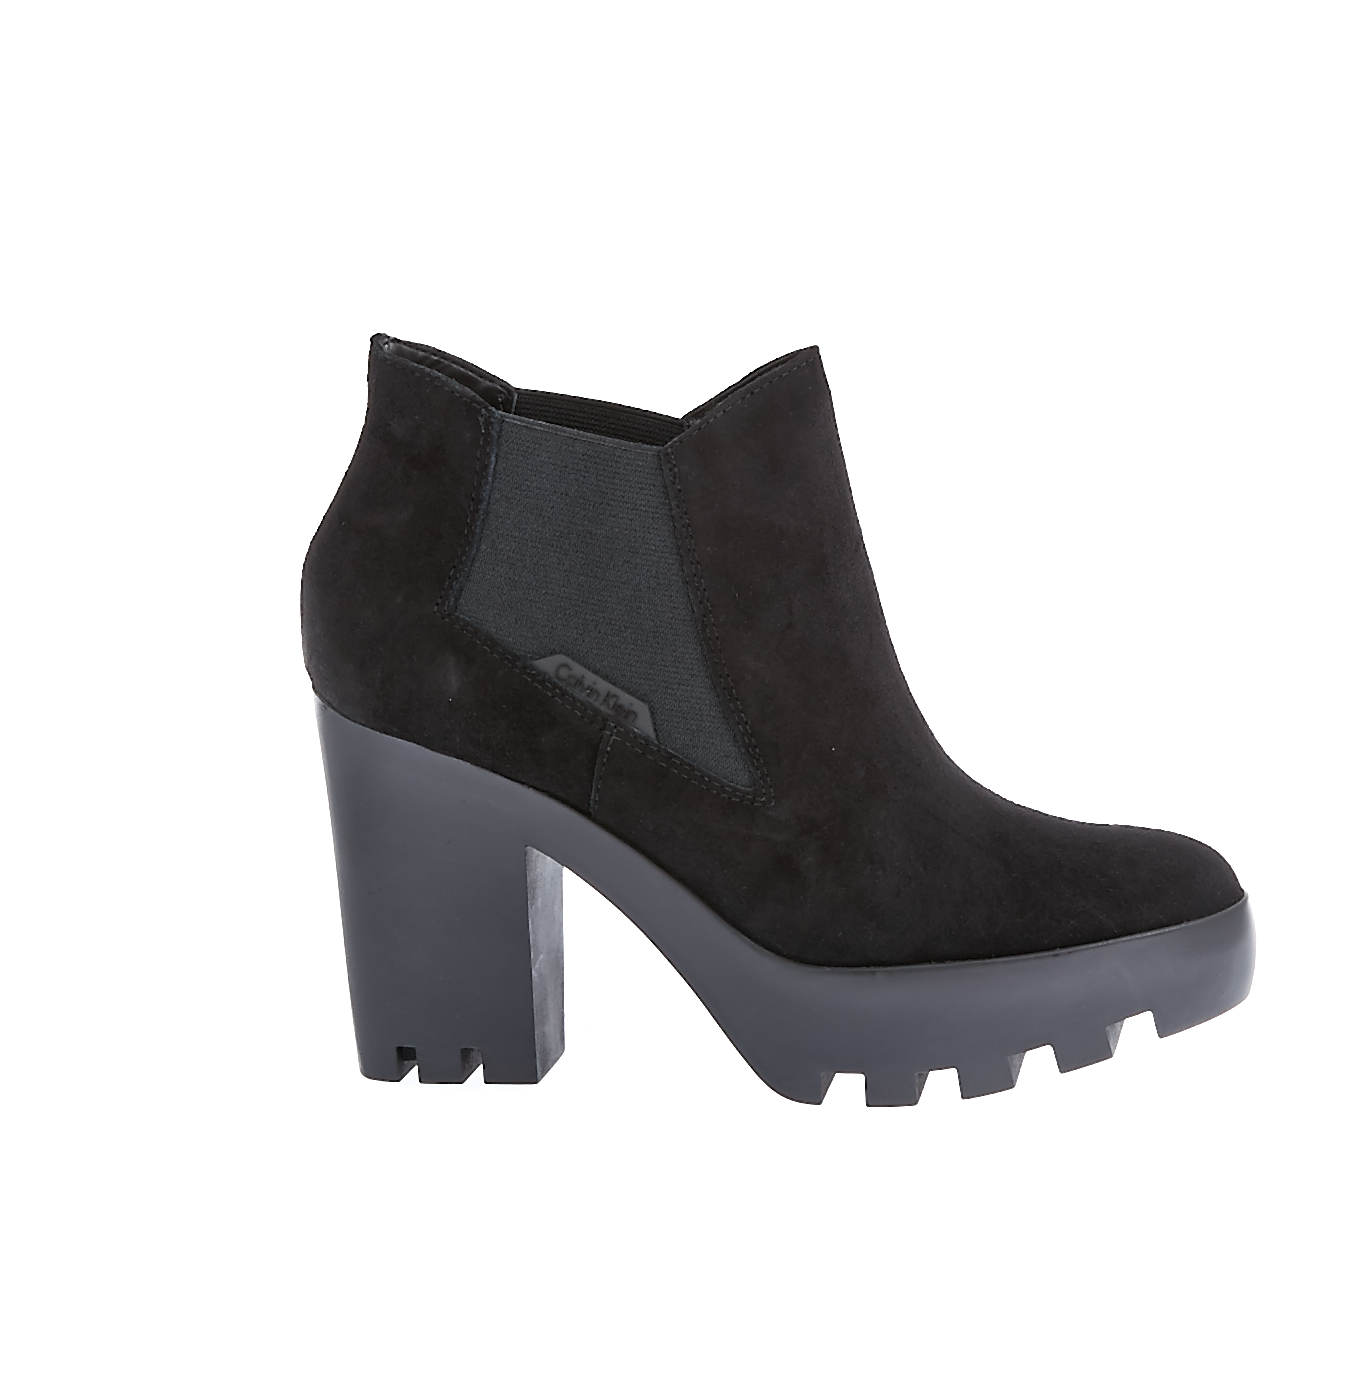 CALVIN KLEIN JEANS - Γυναικεία μποτάκια Calvin Klein Jeans μαύρα